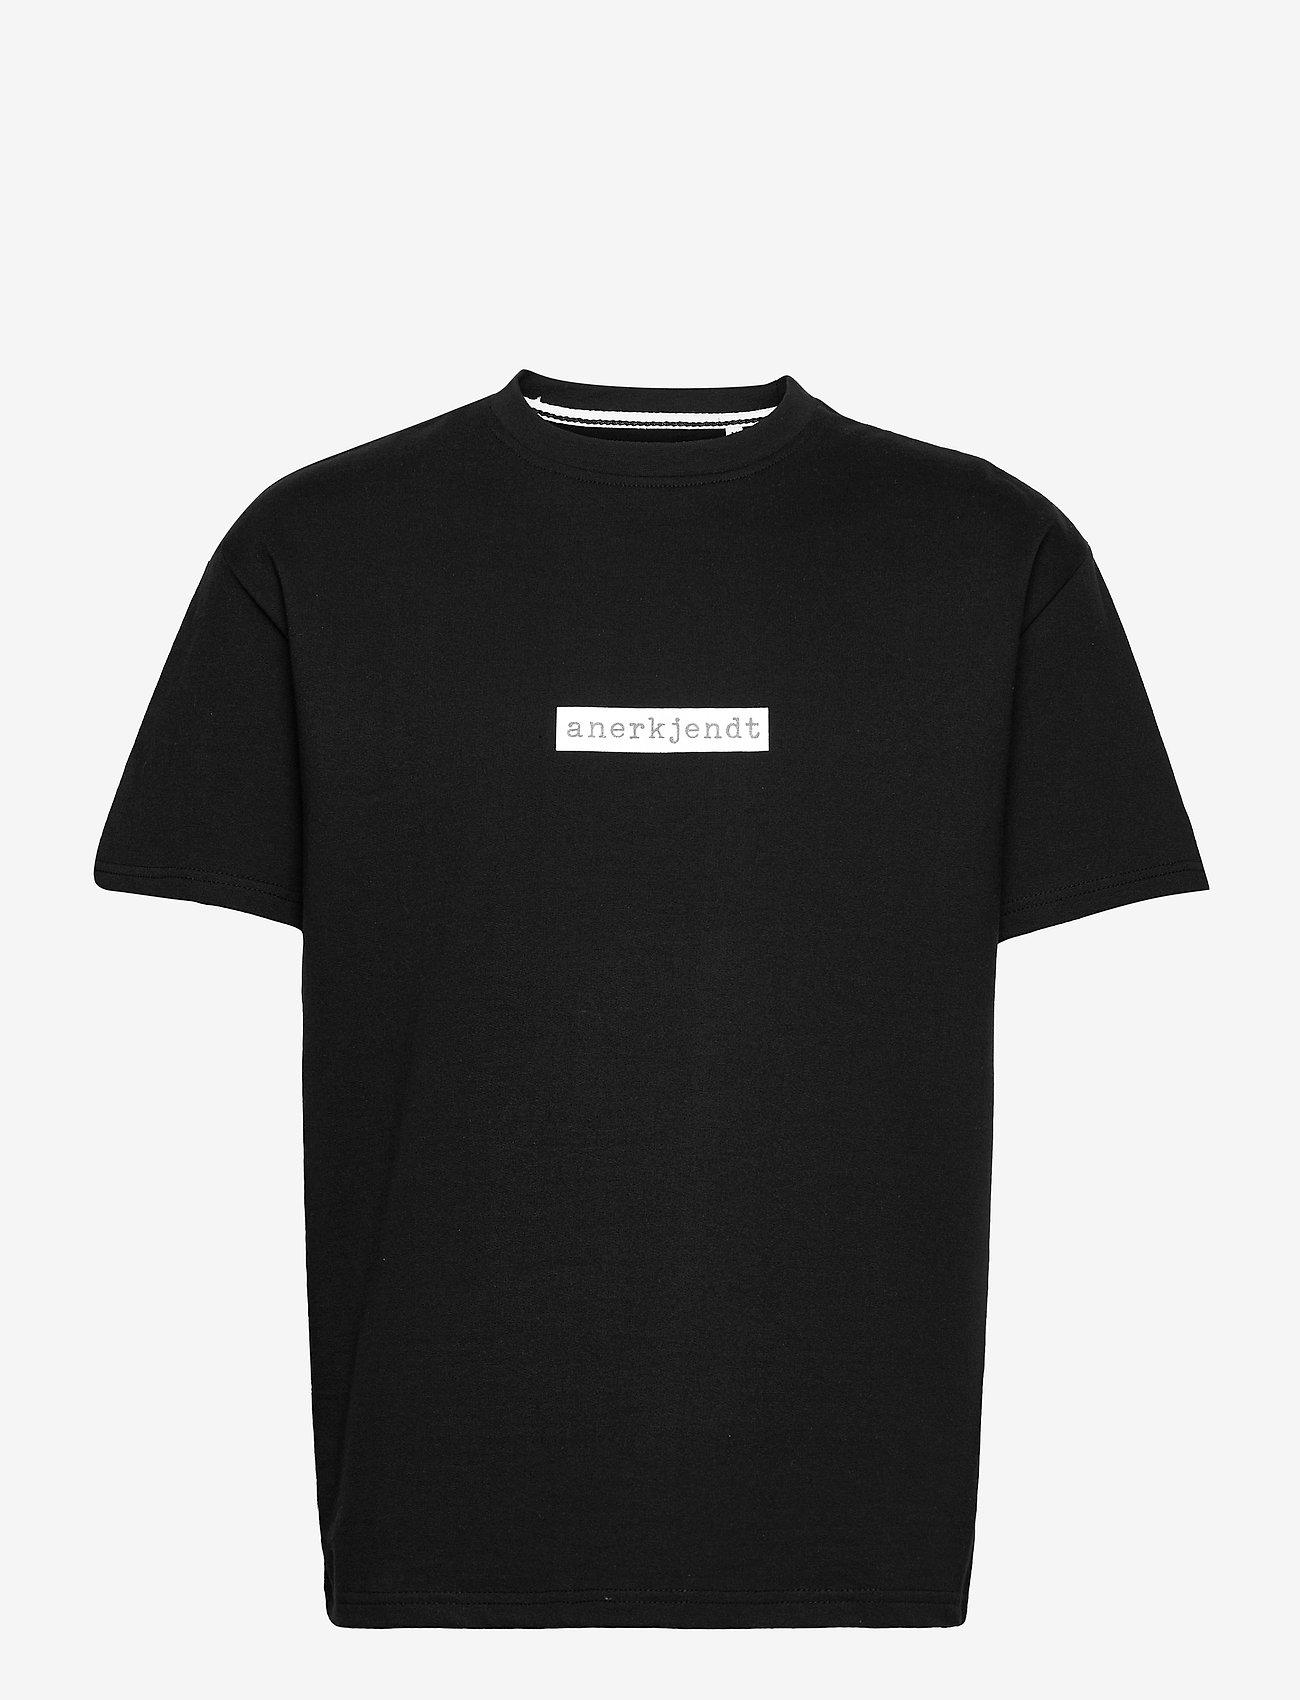 Anerkjendt - AKARNE BOXY SWEAT - t-shirts - caviar - 1